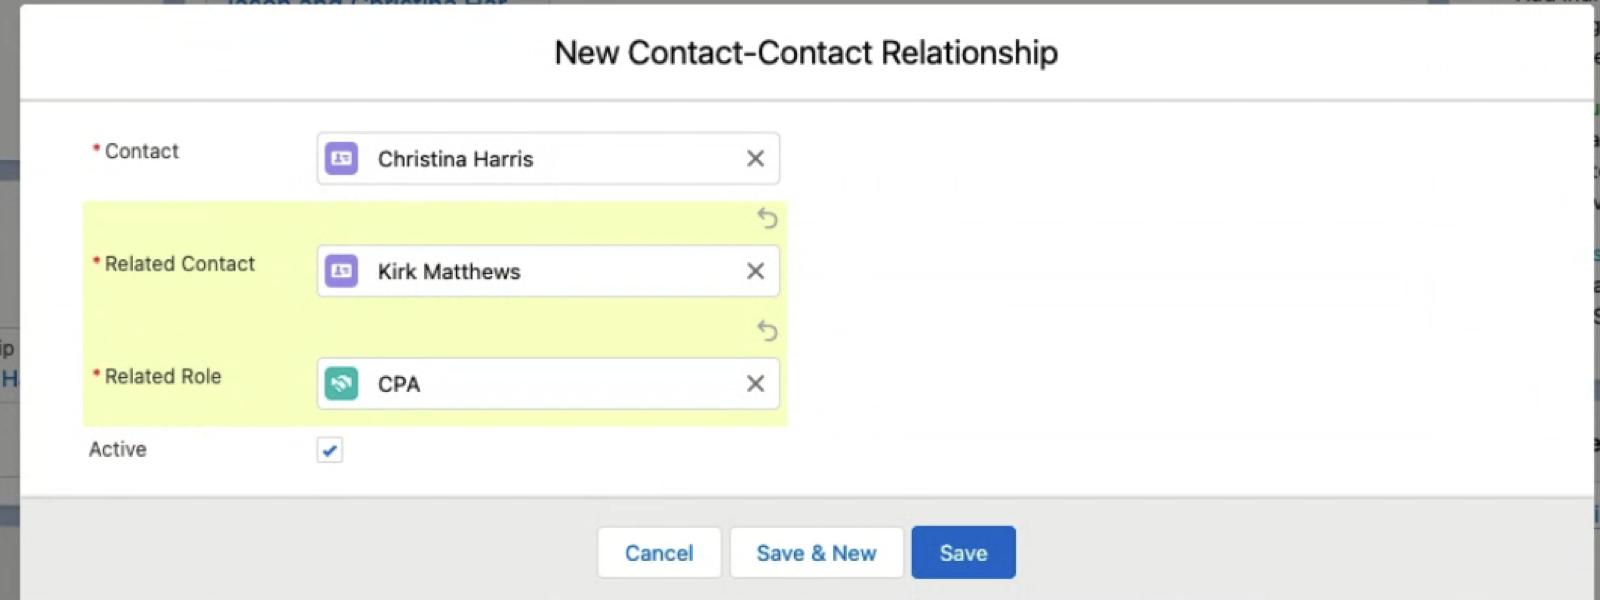 contact-contact